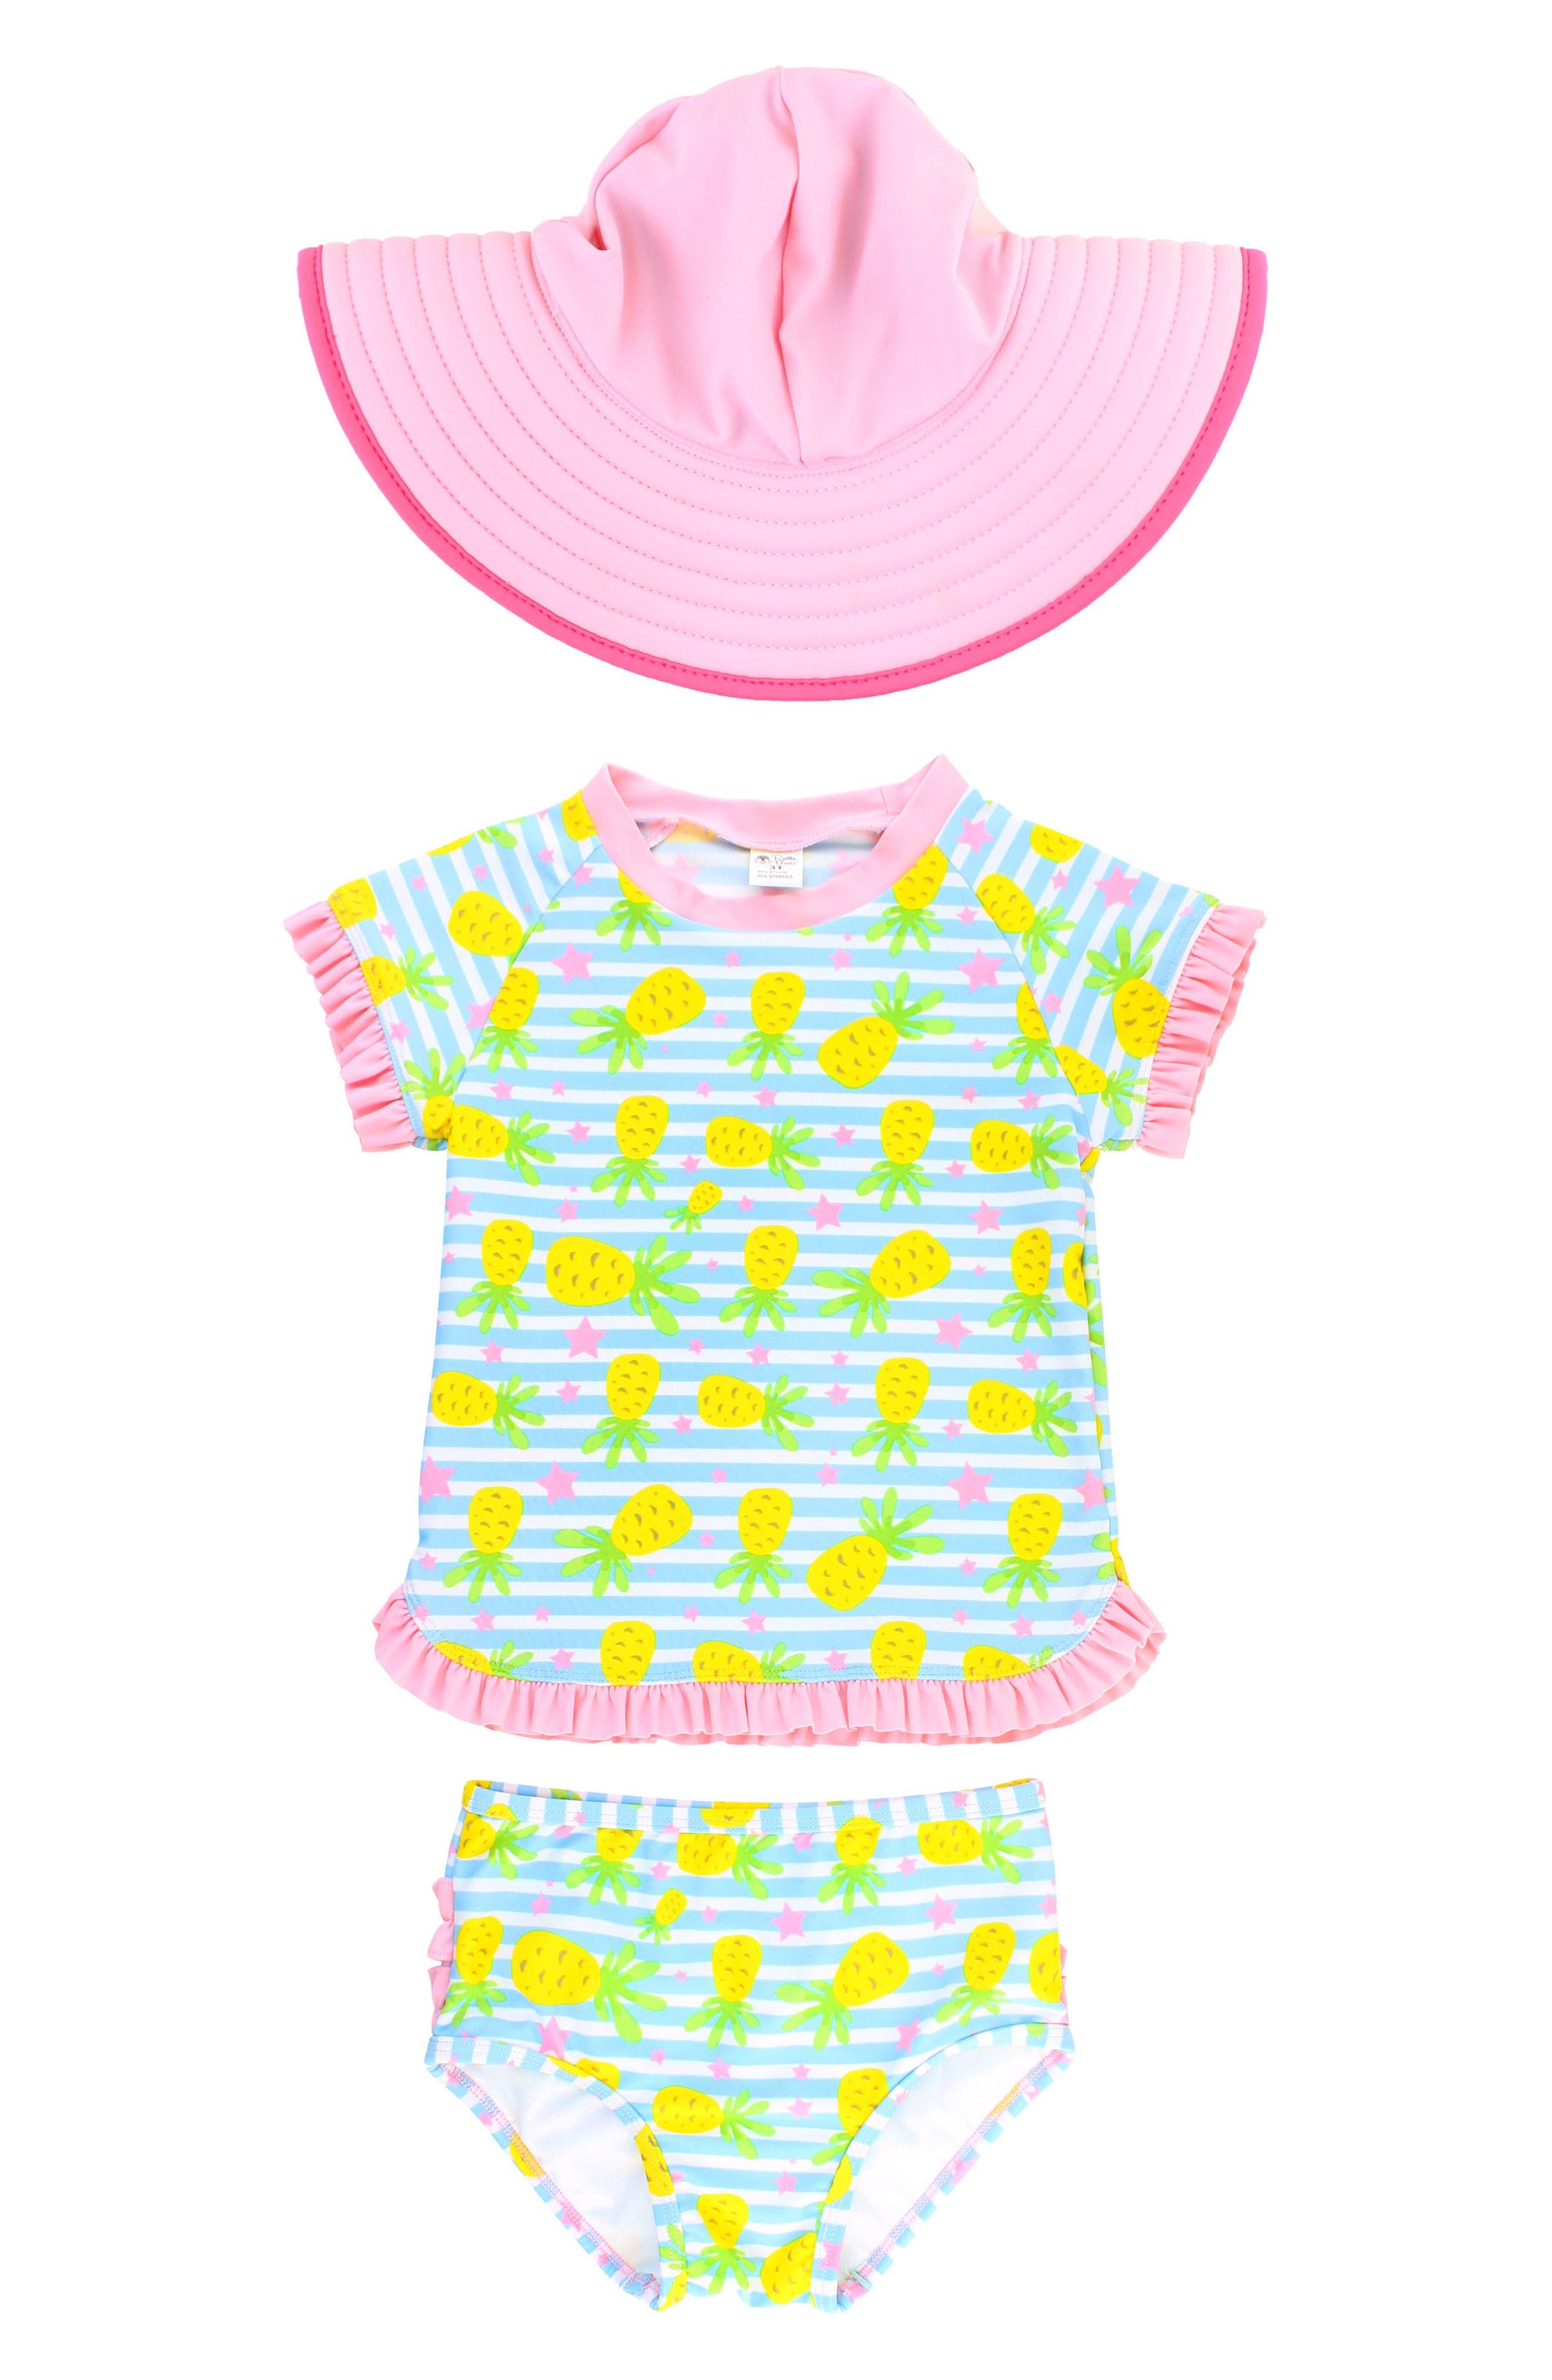 Paradise Two-Piece Rashguard Swimsuit & Hat Set,                             Main thumbnail 1, color,                             400